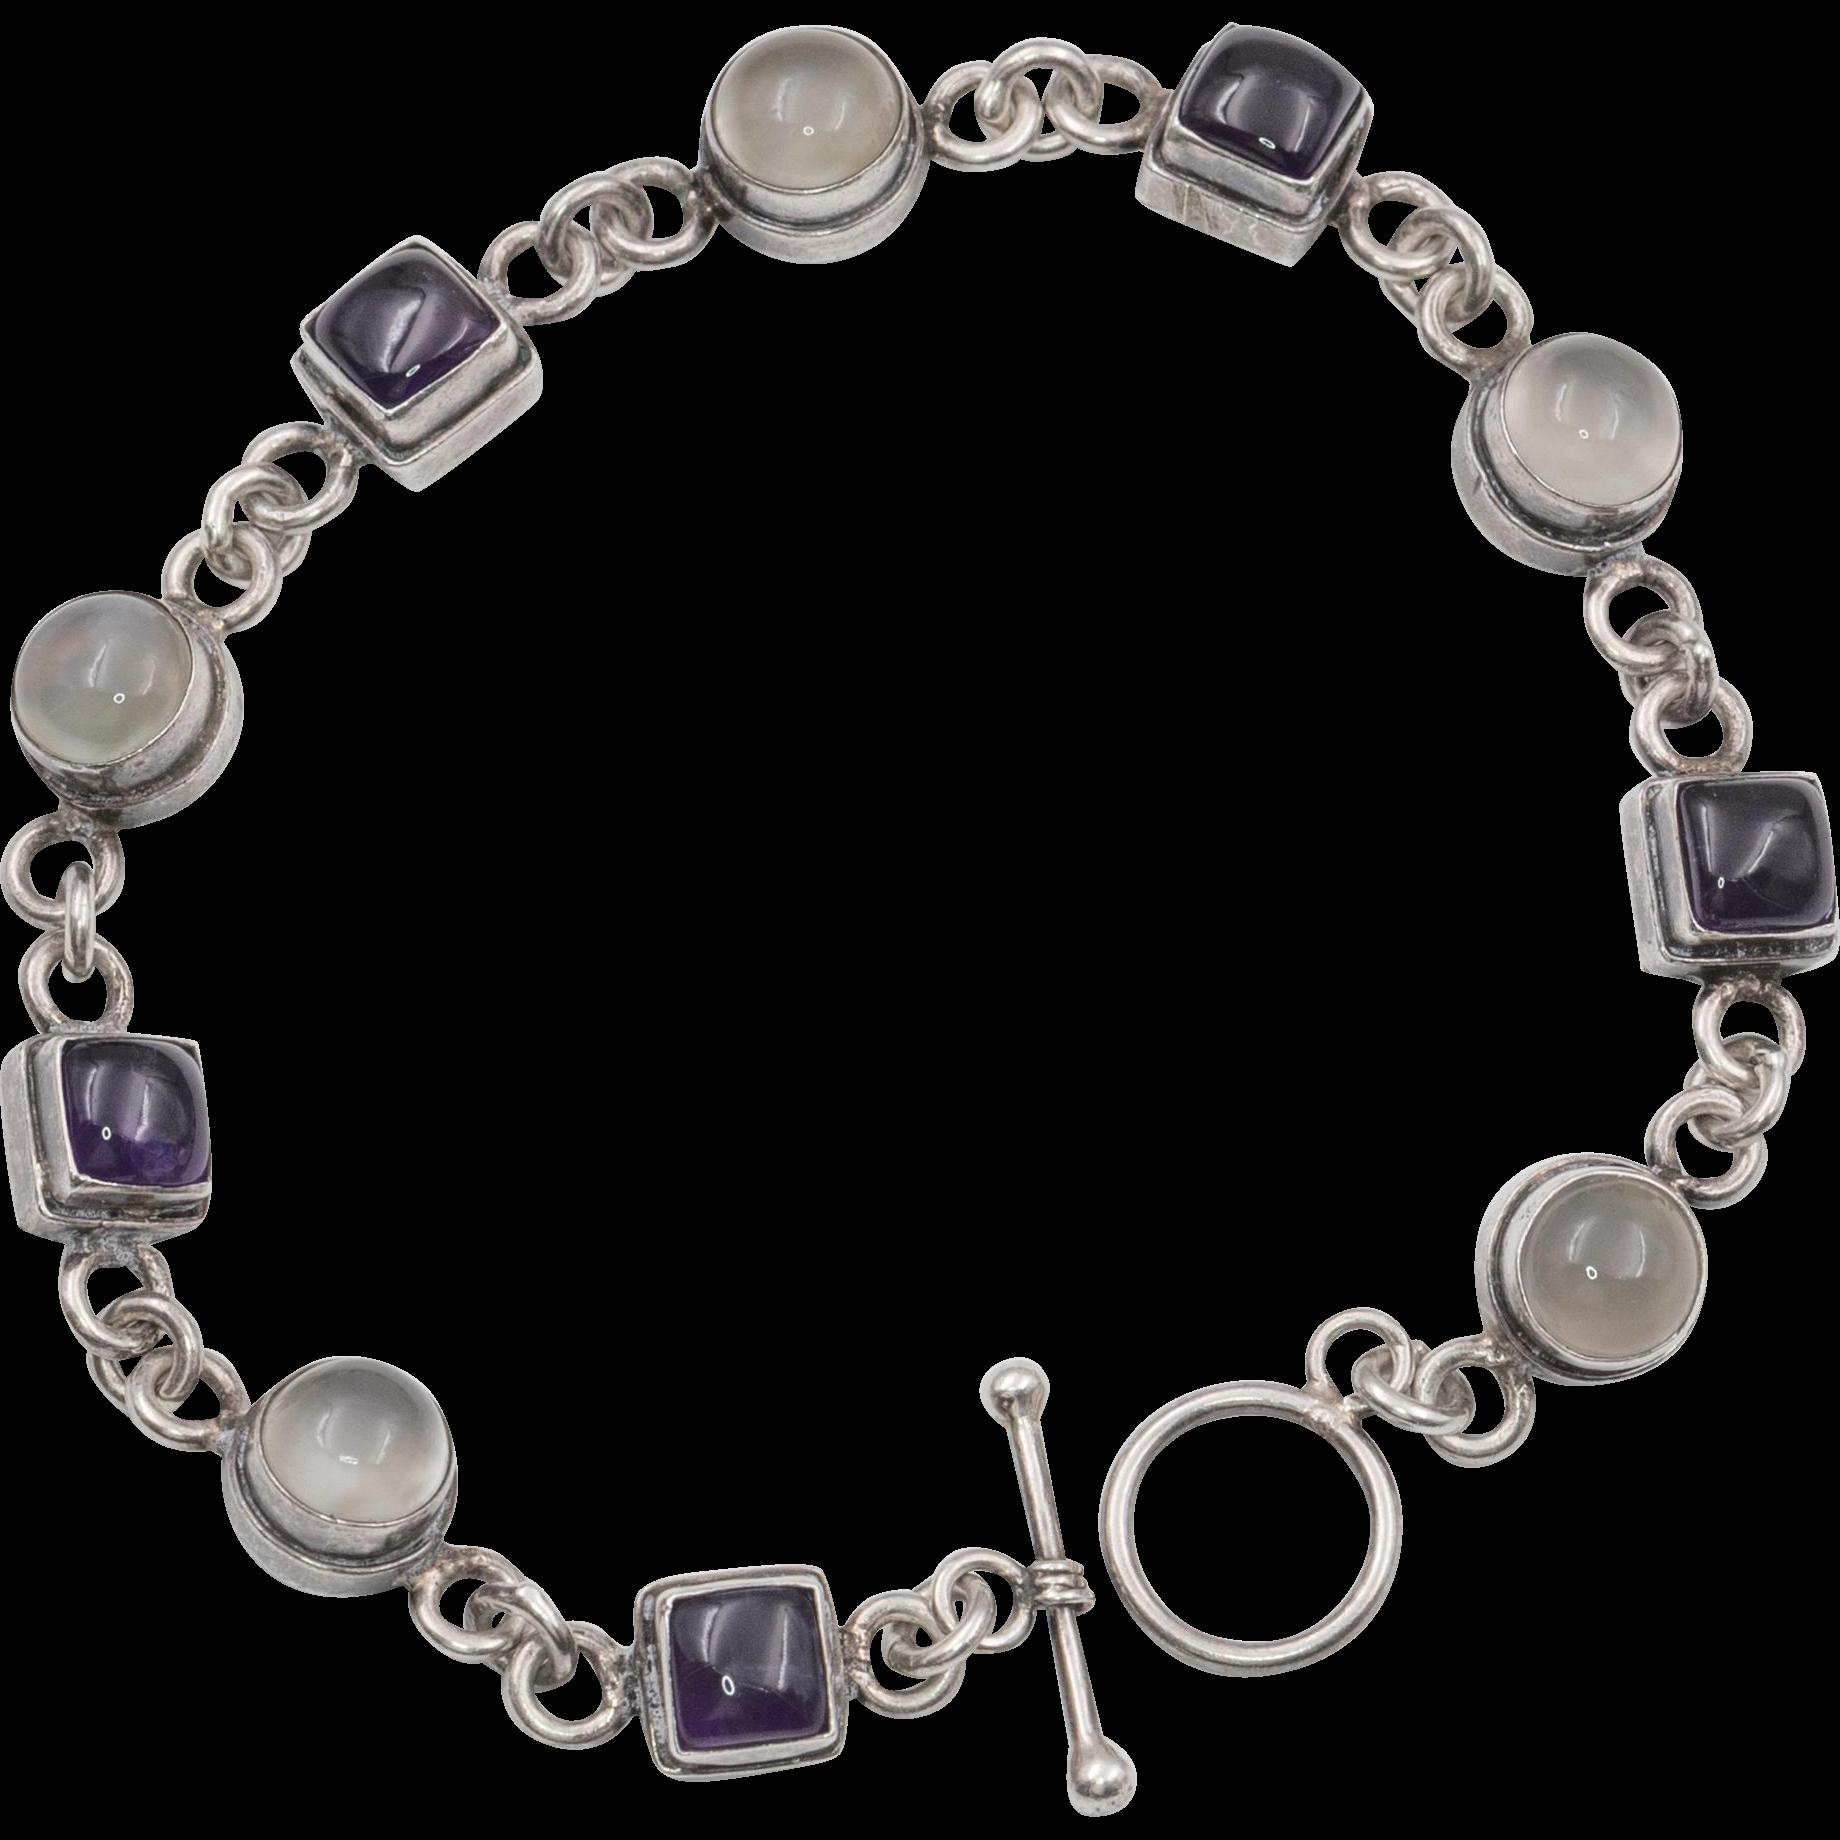 Sterling silver cat 39 s eye moonstone bracelet 7 5 inches for Cat s eye moonstone jewelry